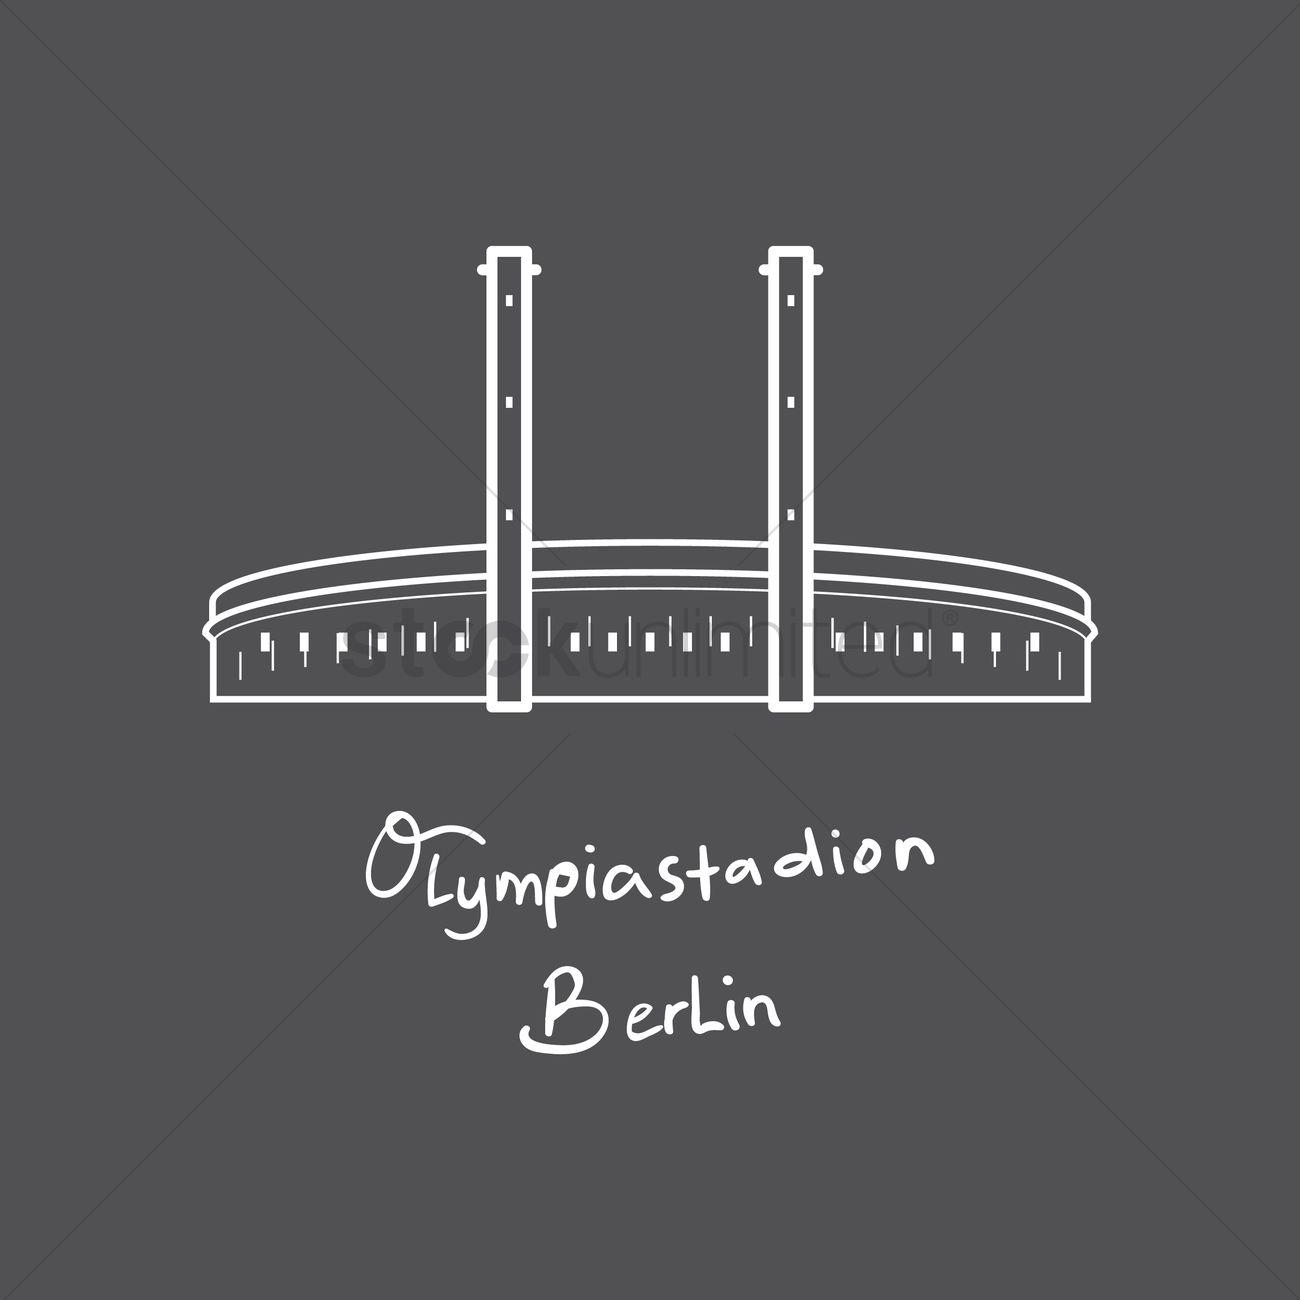 Olympiastadion berlin Vector Image.